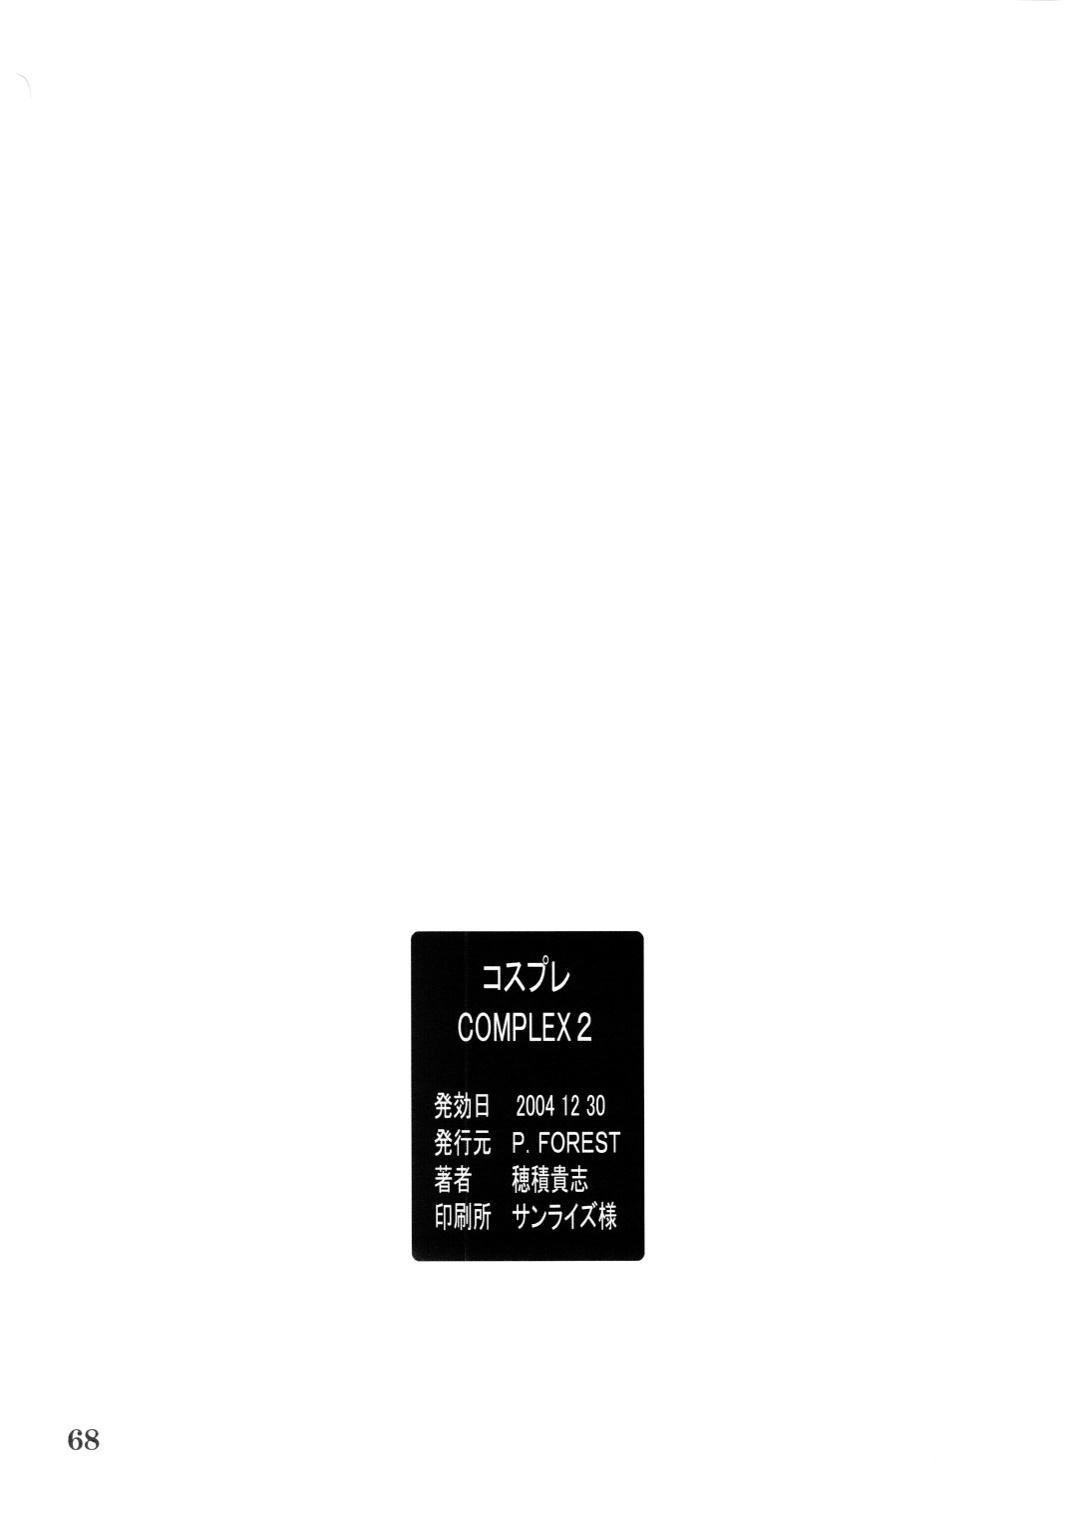 Cosplay COMPLEX 2 66